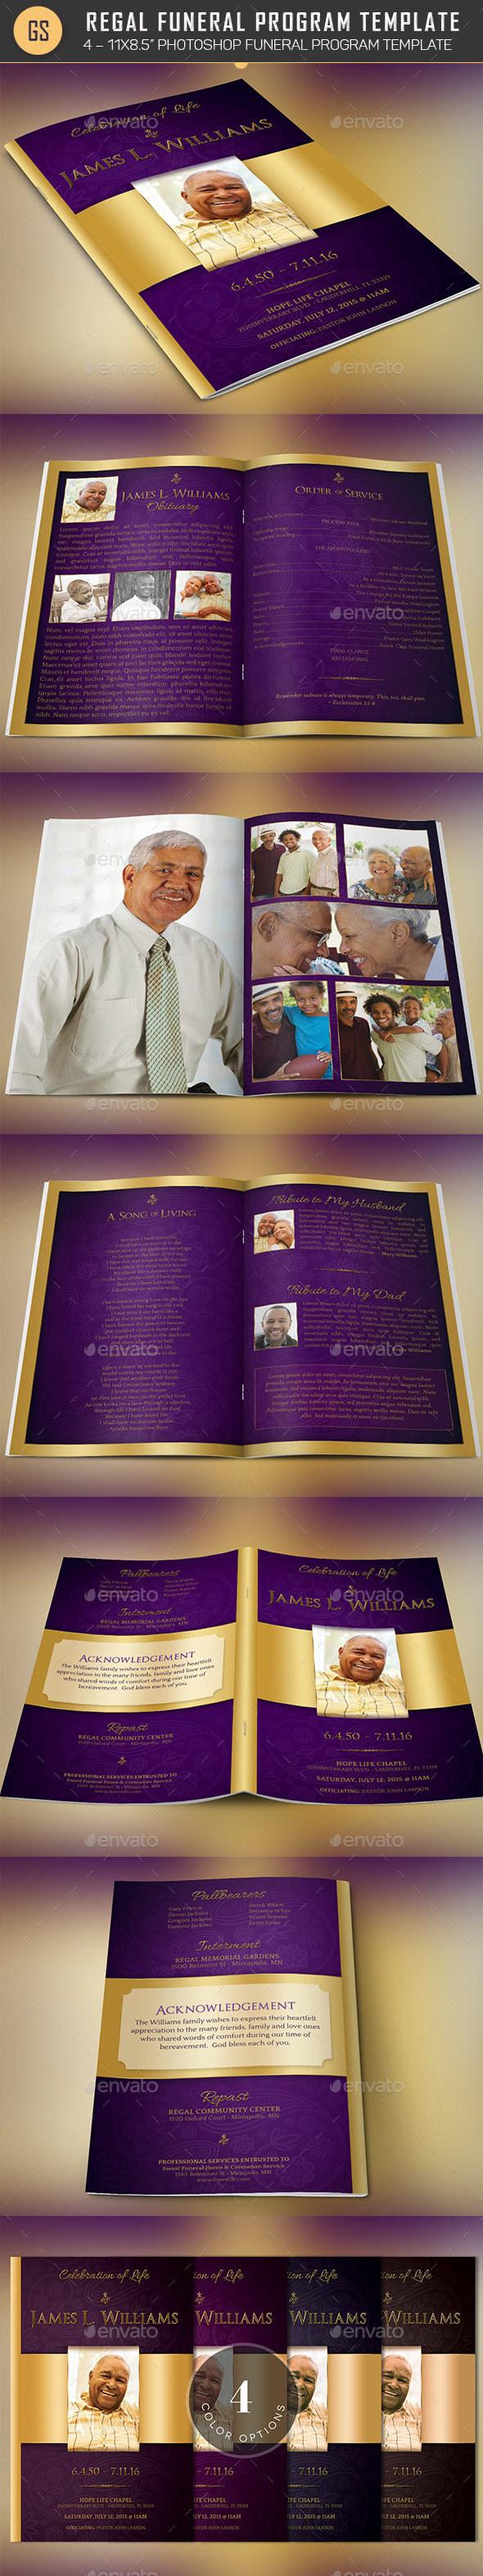 Regal Funeral Program Template - Informational Brochures